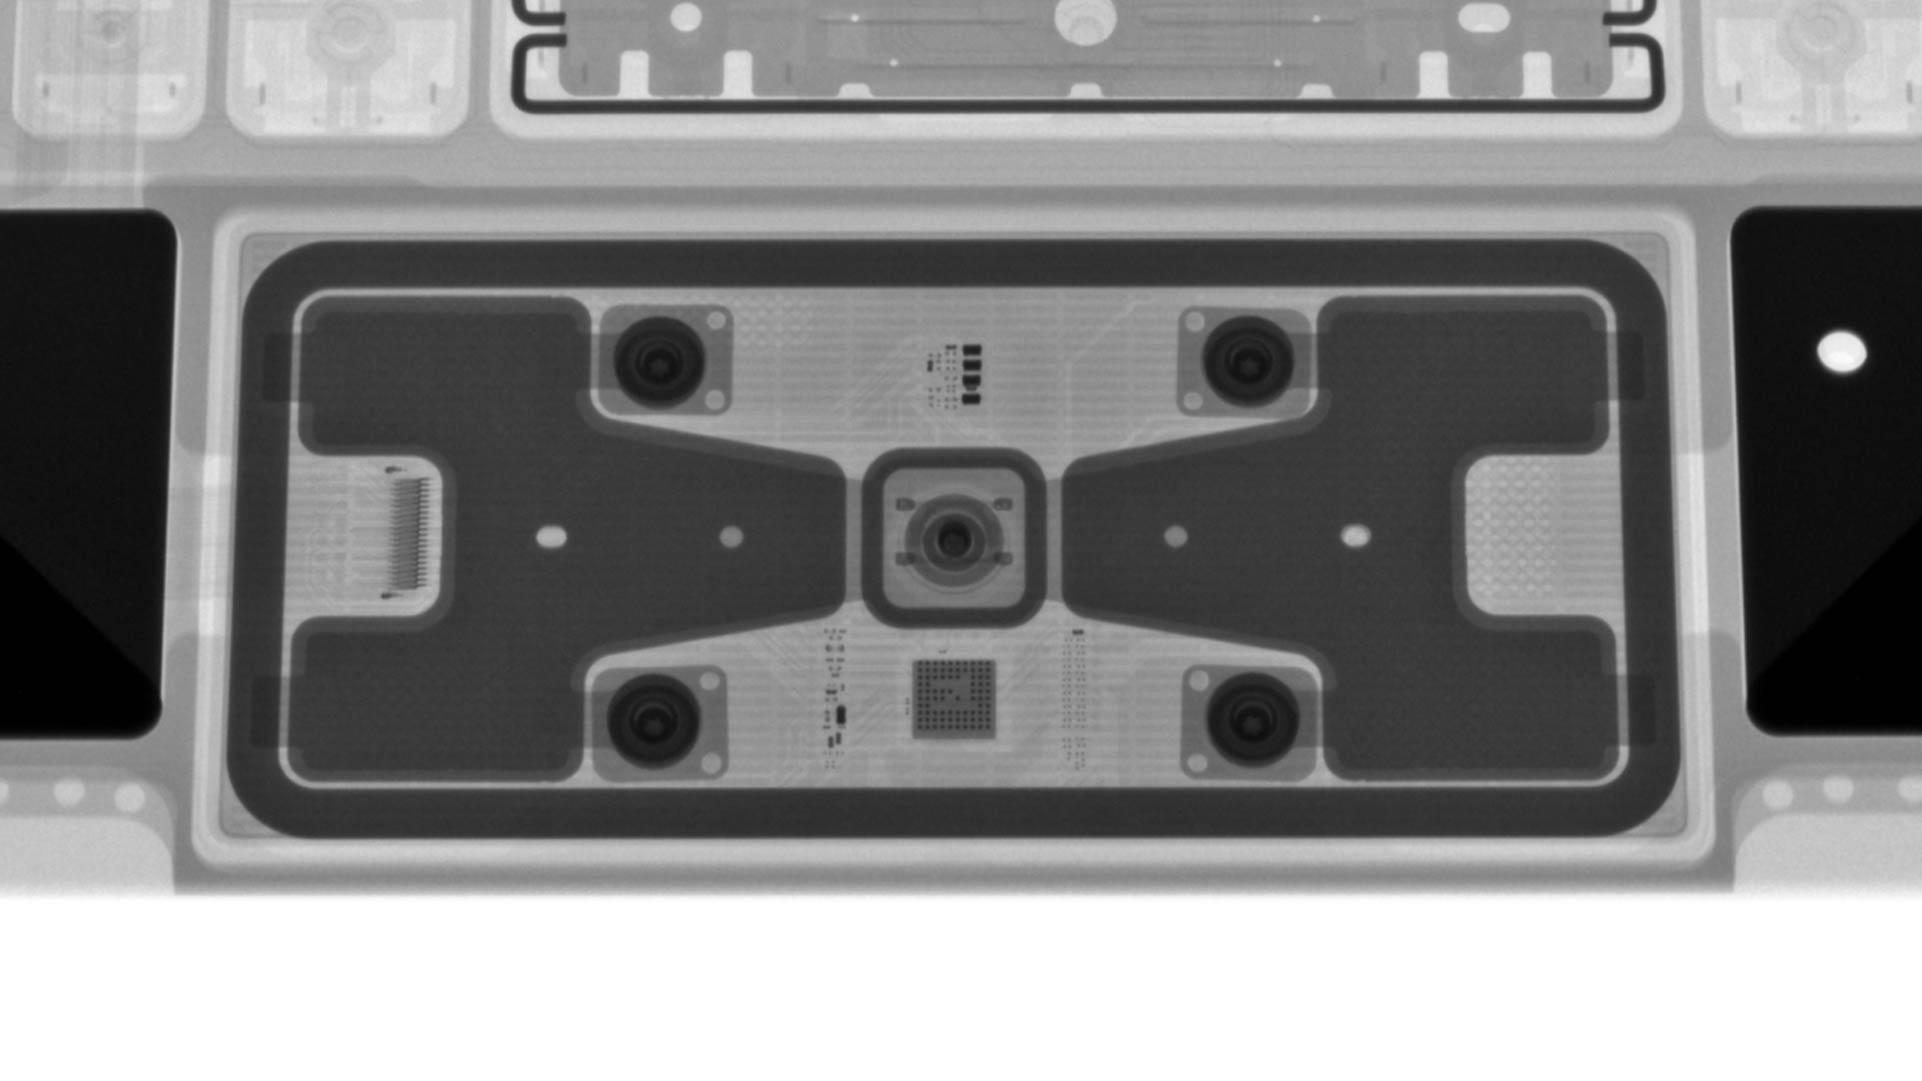 X射线下的iPad Pro妙控键盘:设计复杂 排布工整